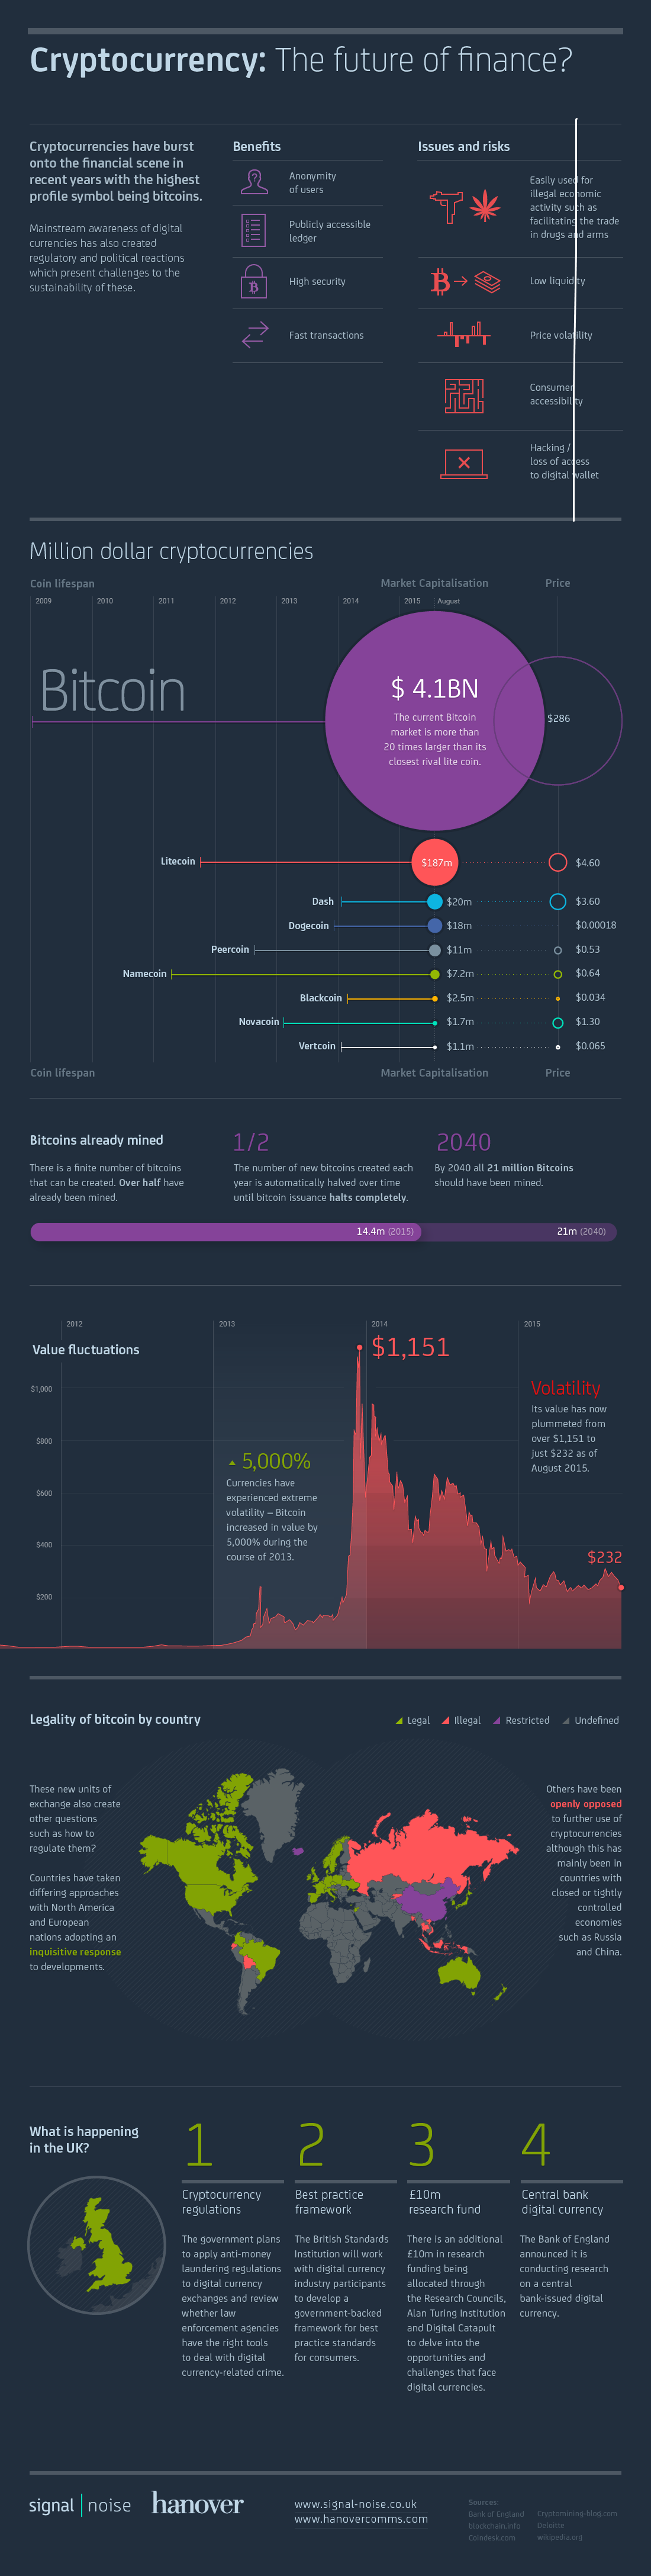 Cryptocurrencies infographic_FINAL